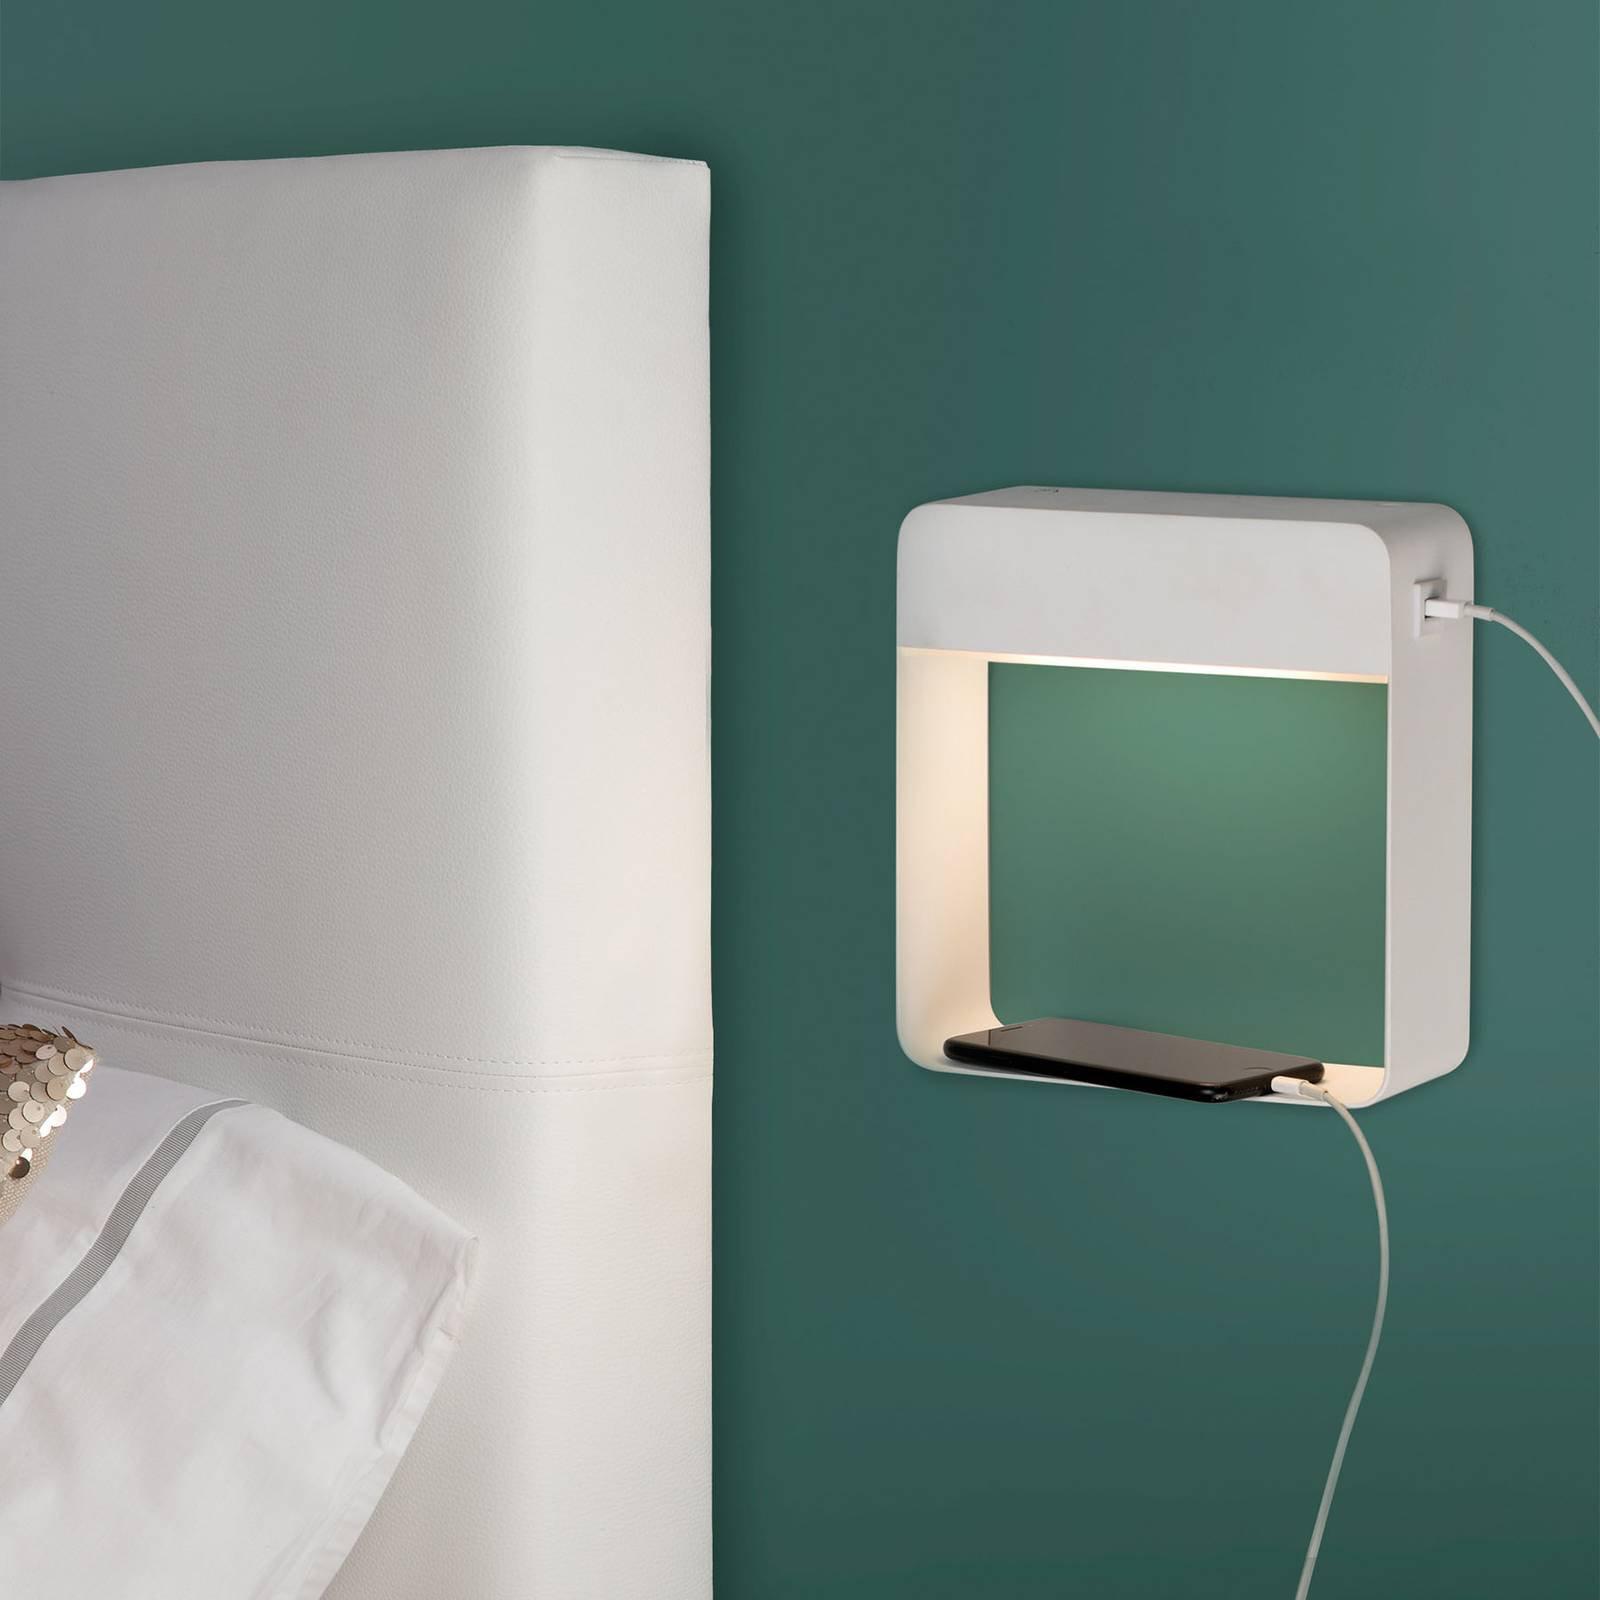 LED-vegglampe Denver med USB-lader og bryter